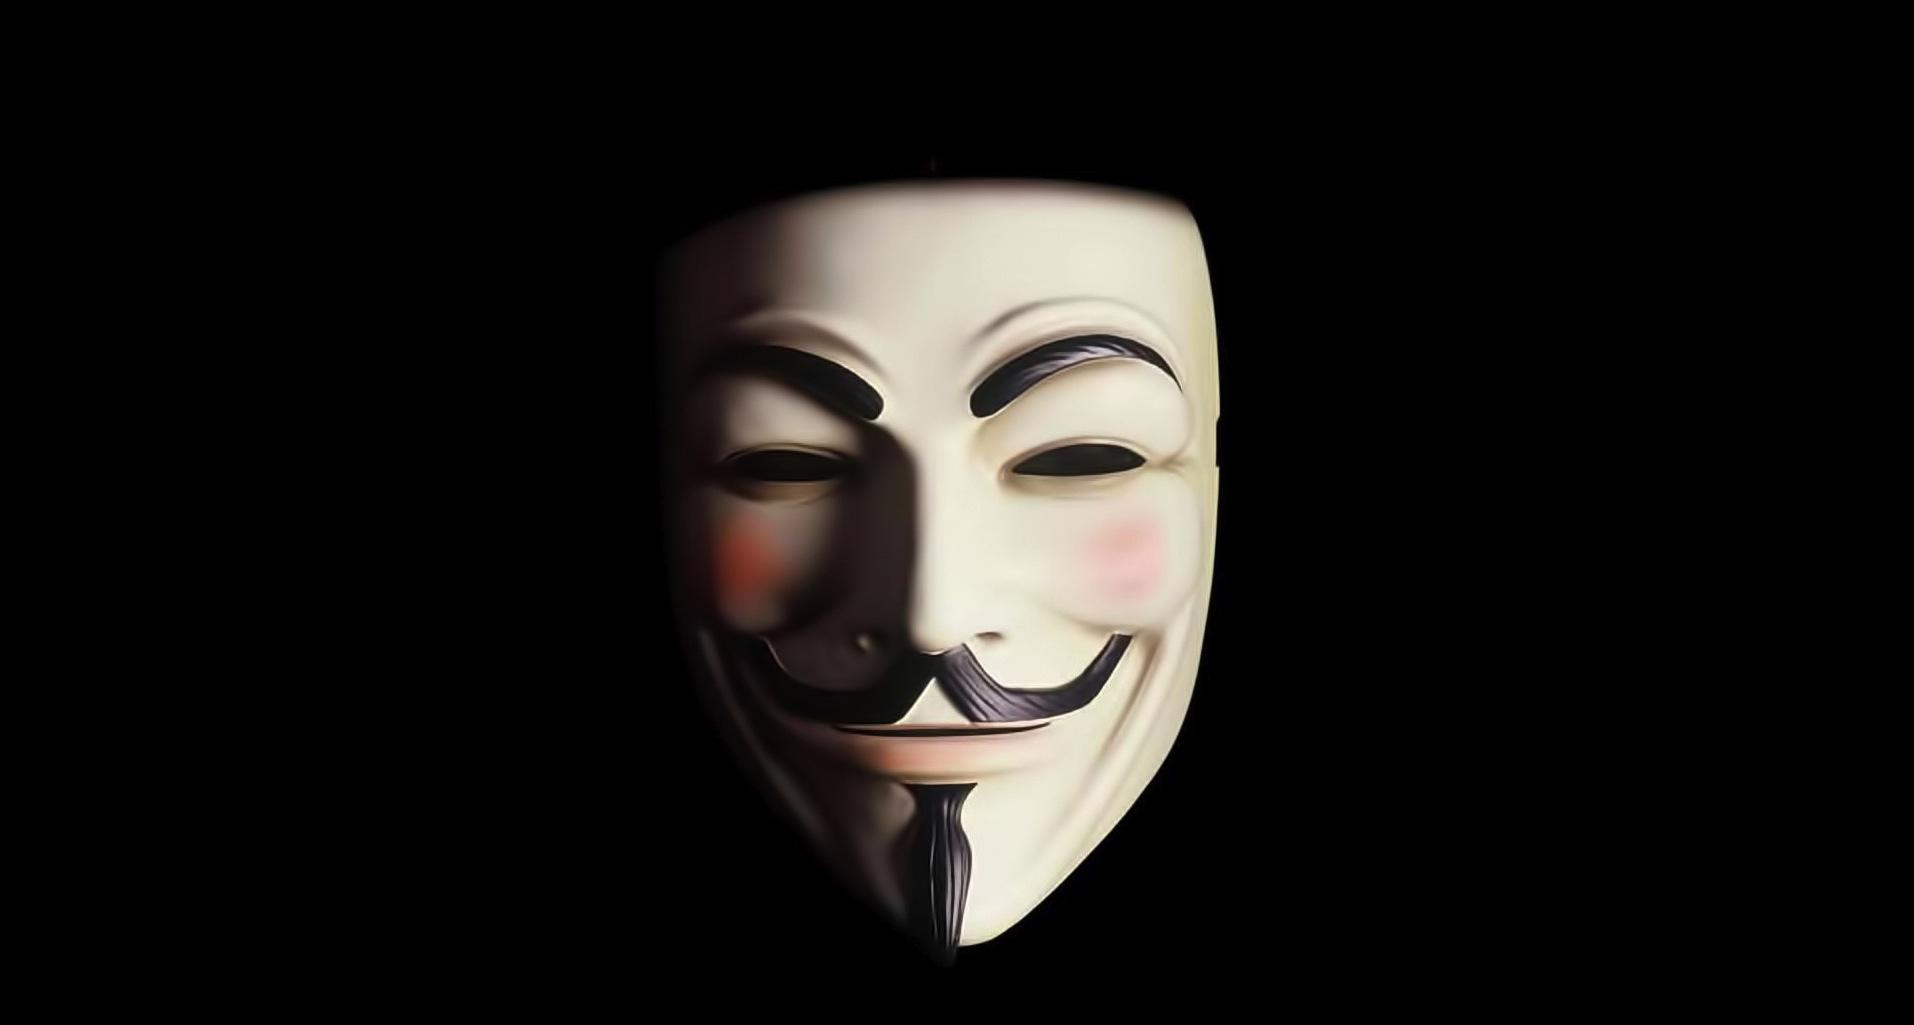 Maschera presente nel film «V per Vendetta»